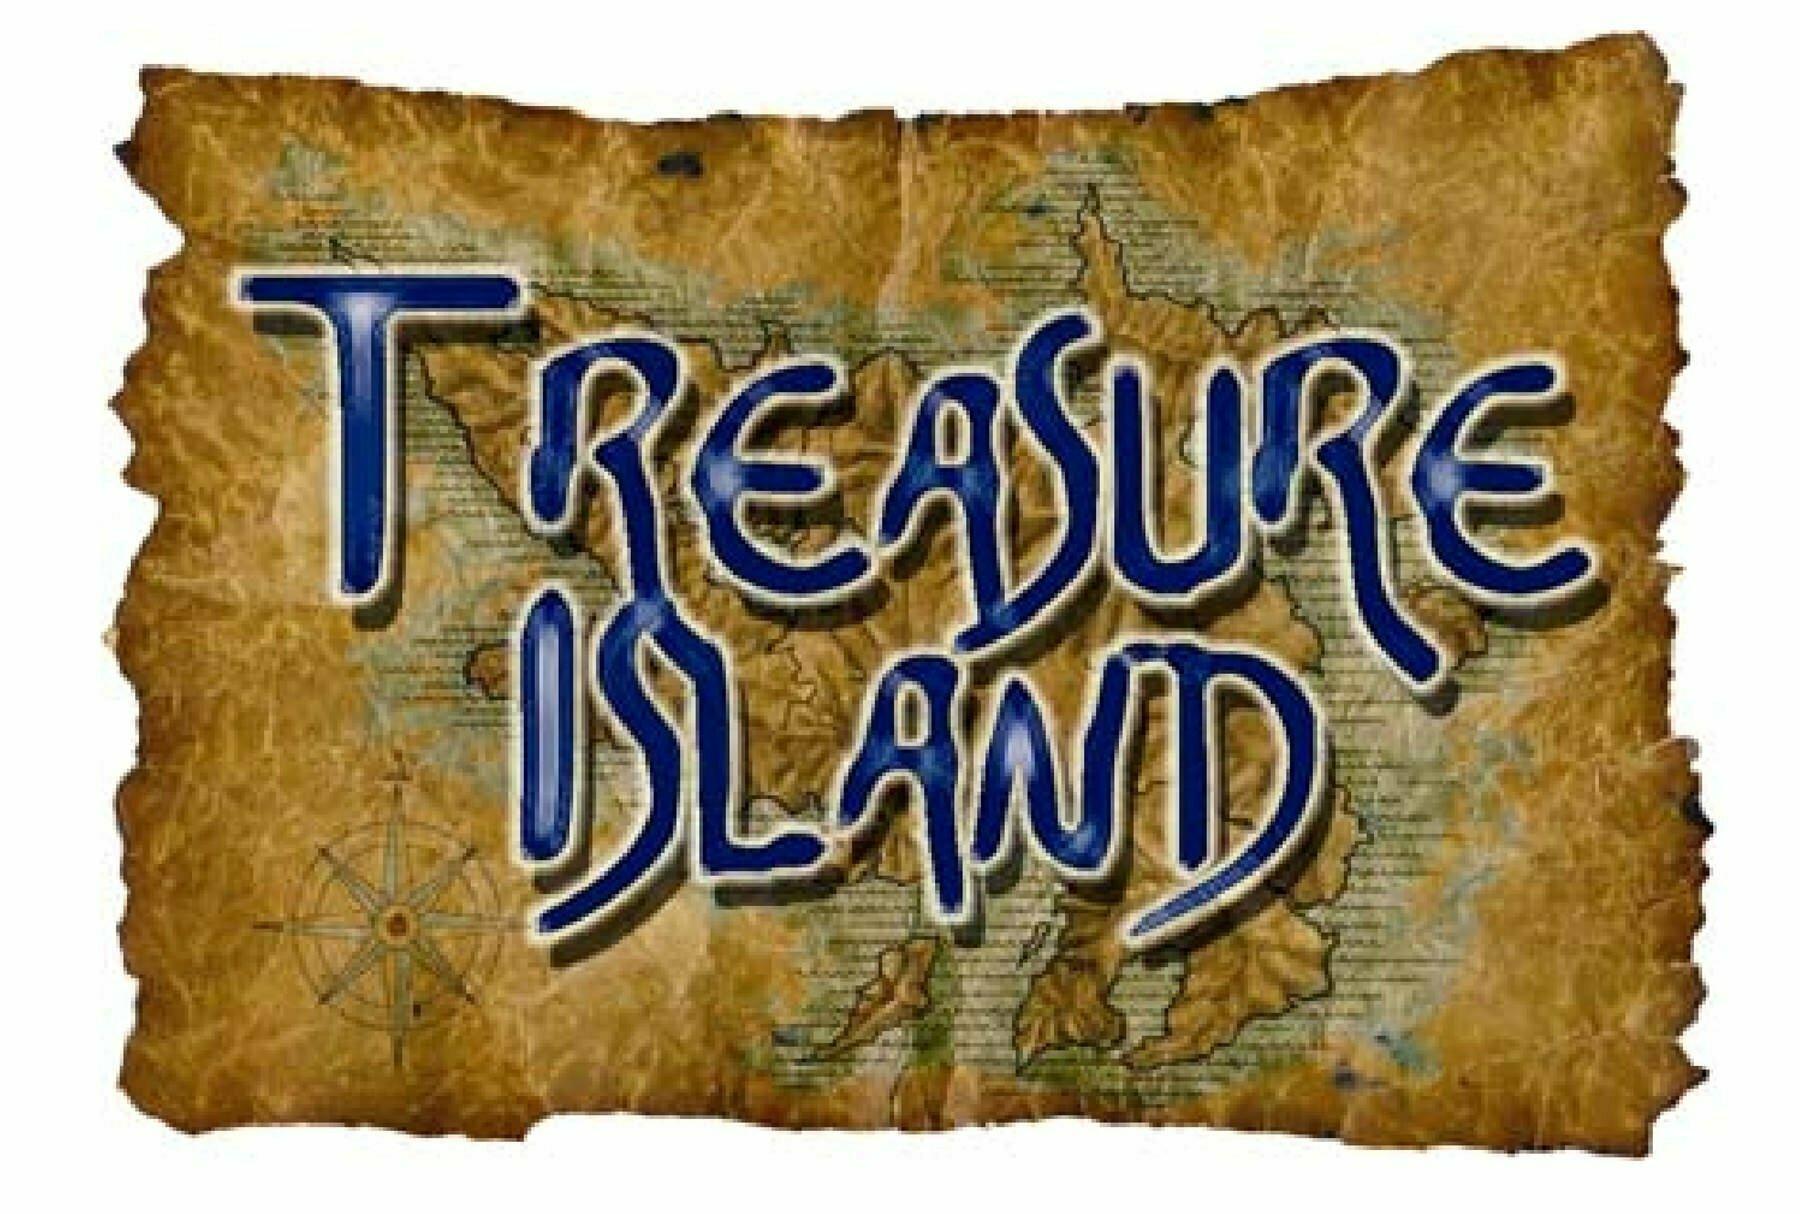 Treasure Island London Review